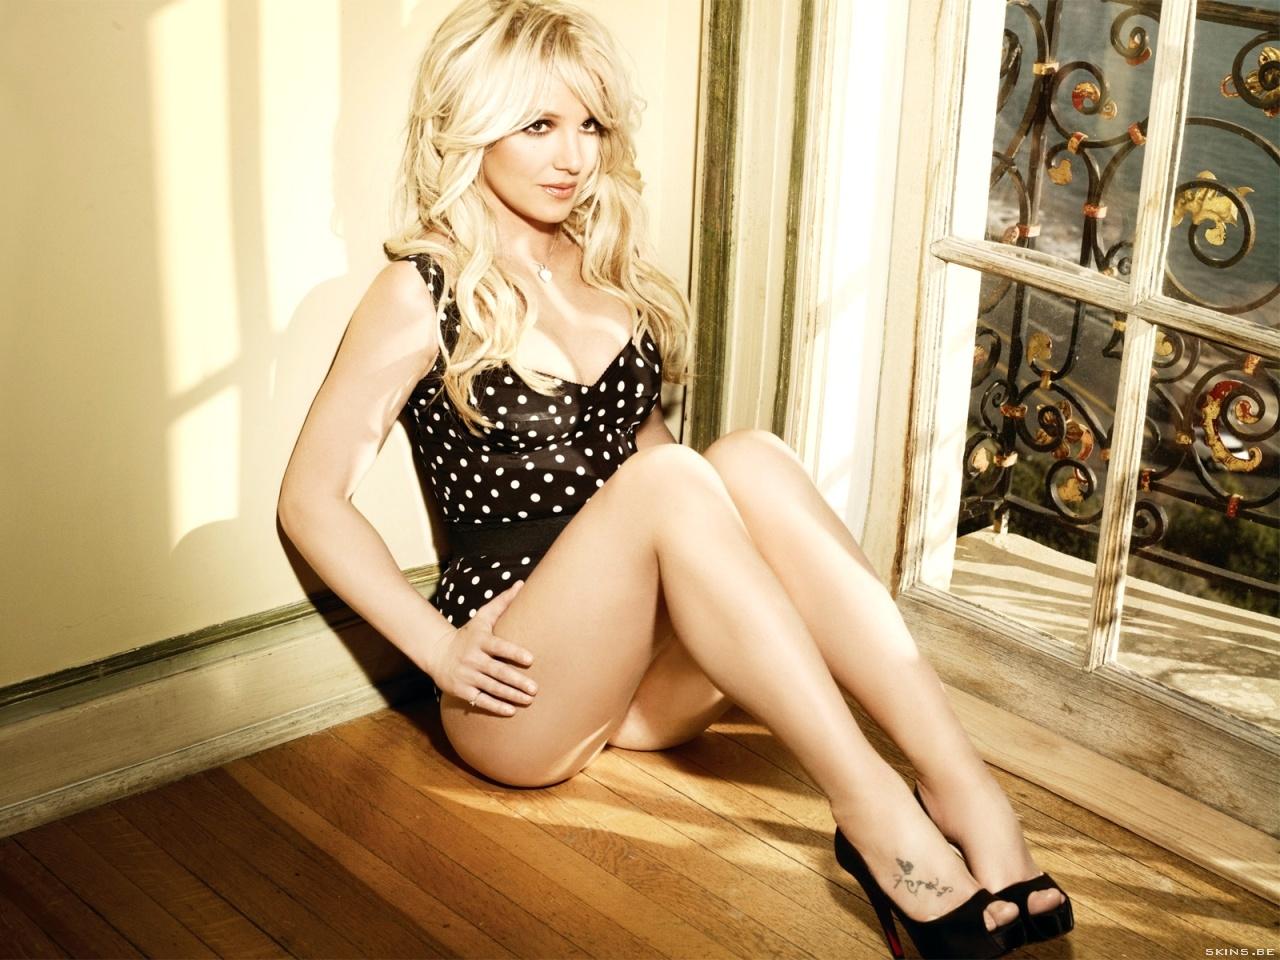 Britney Spears wallpaper (#39945)